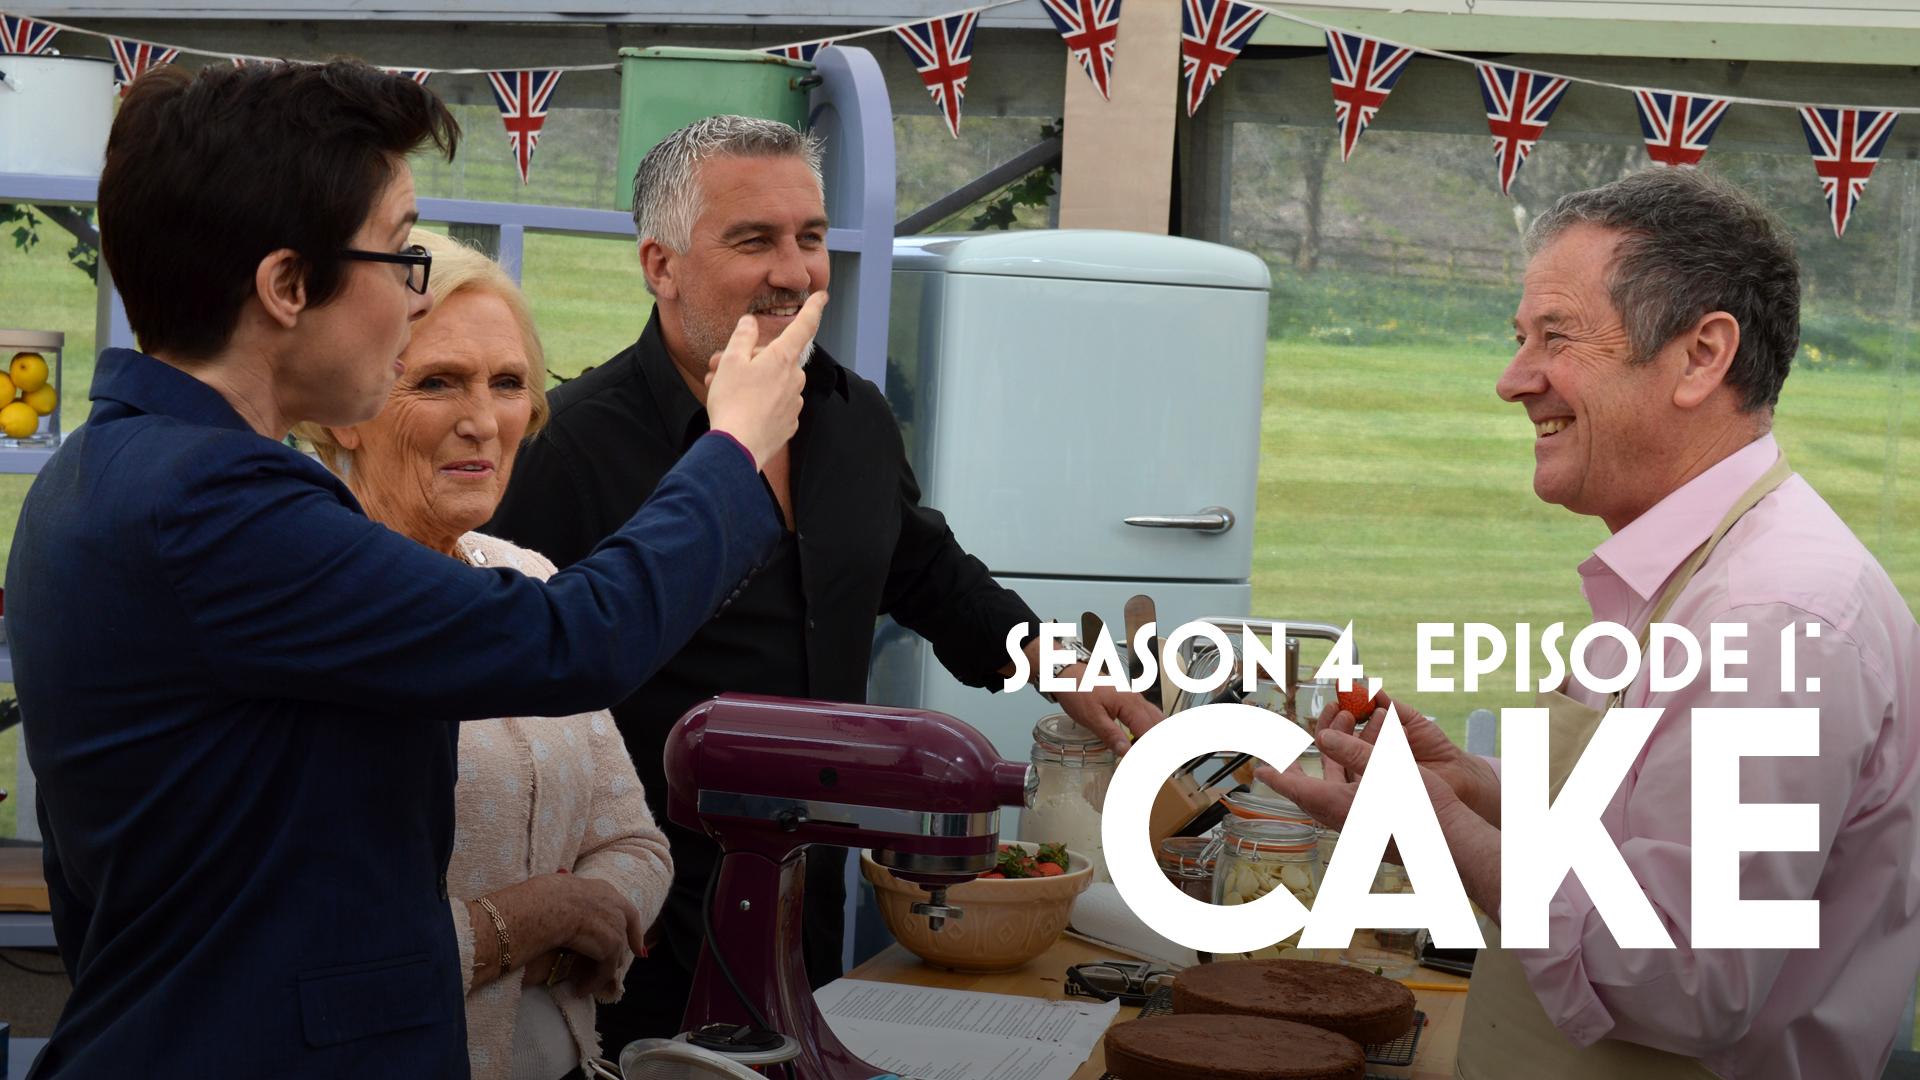 Episode 1: Cake